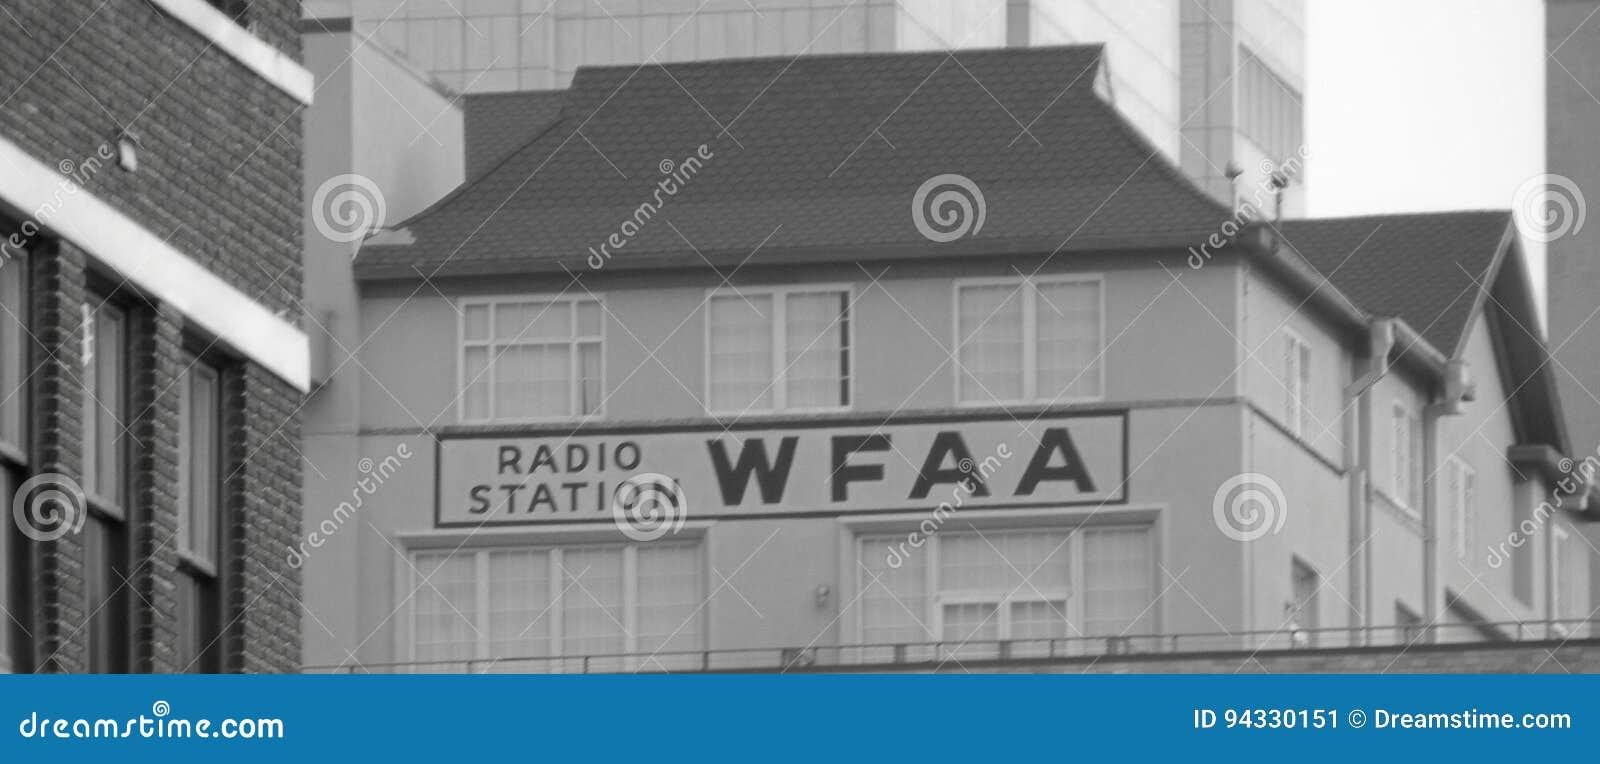 WFAA Radio Station Sign - Dallas TX Editorial Photo - Image